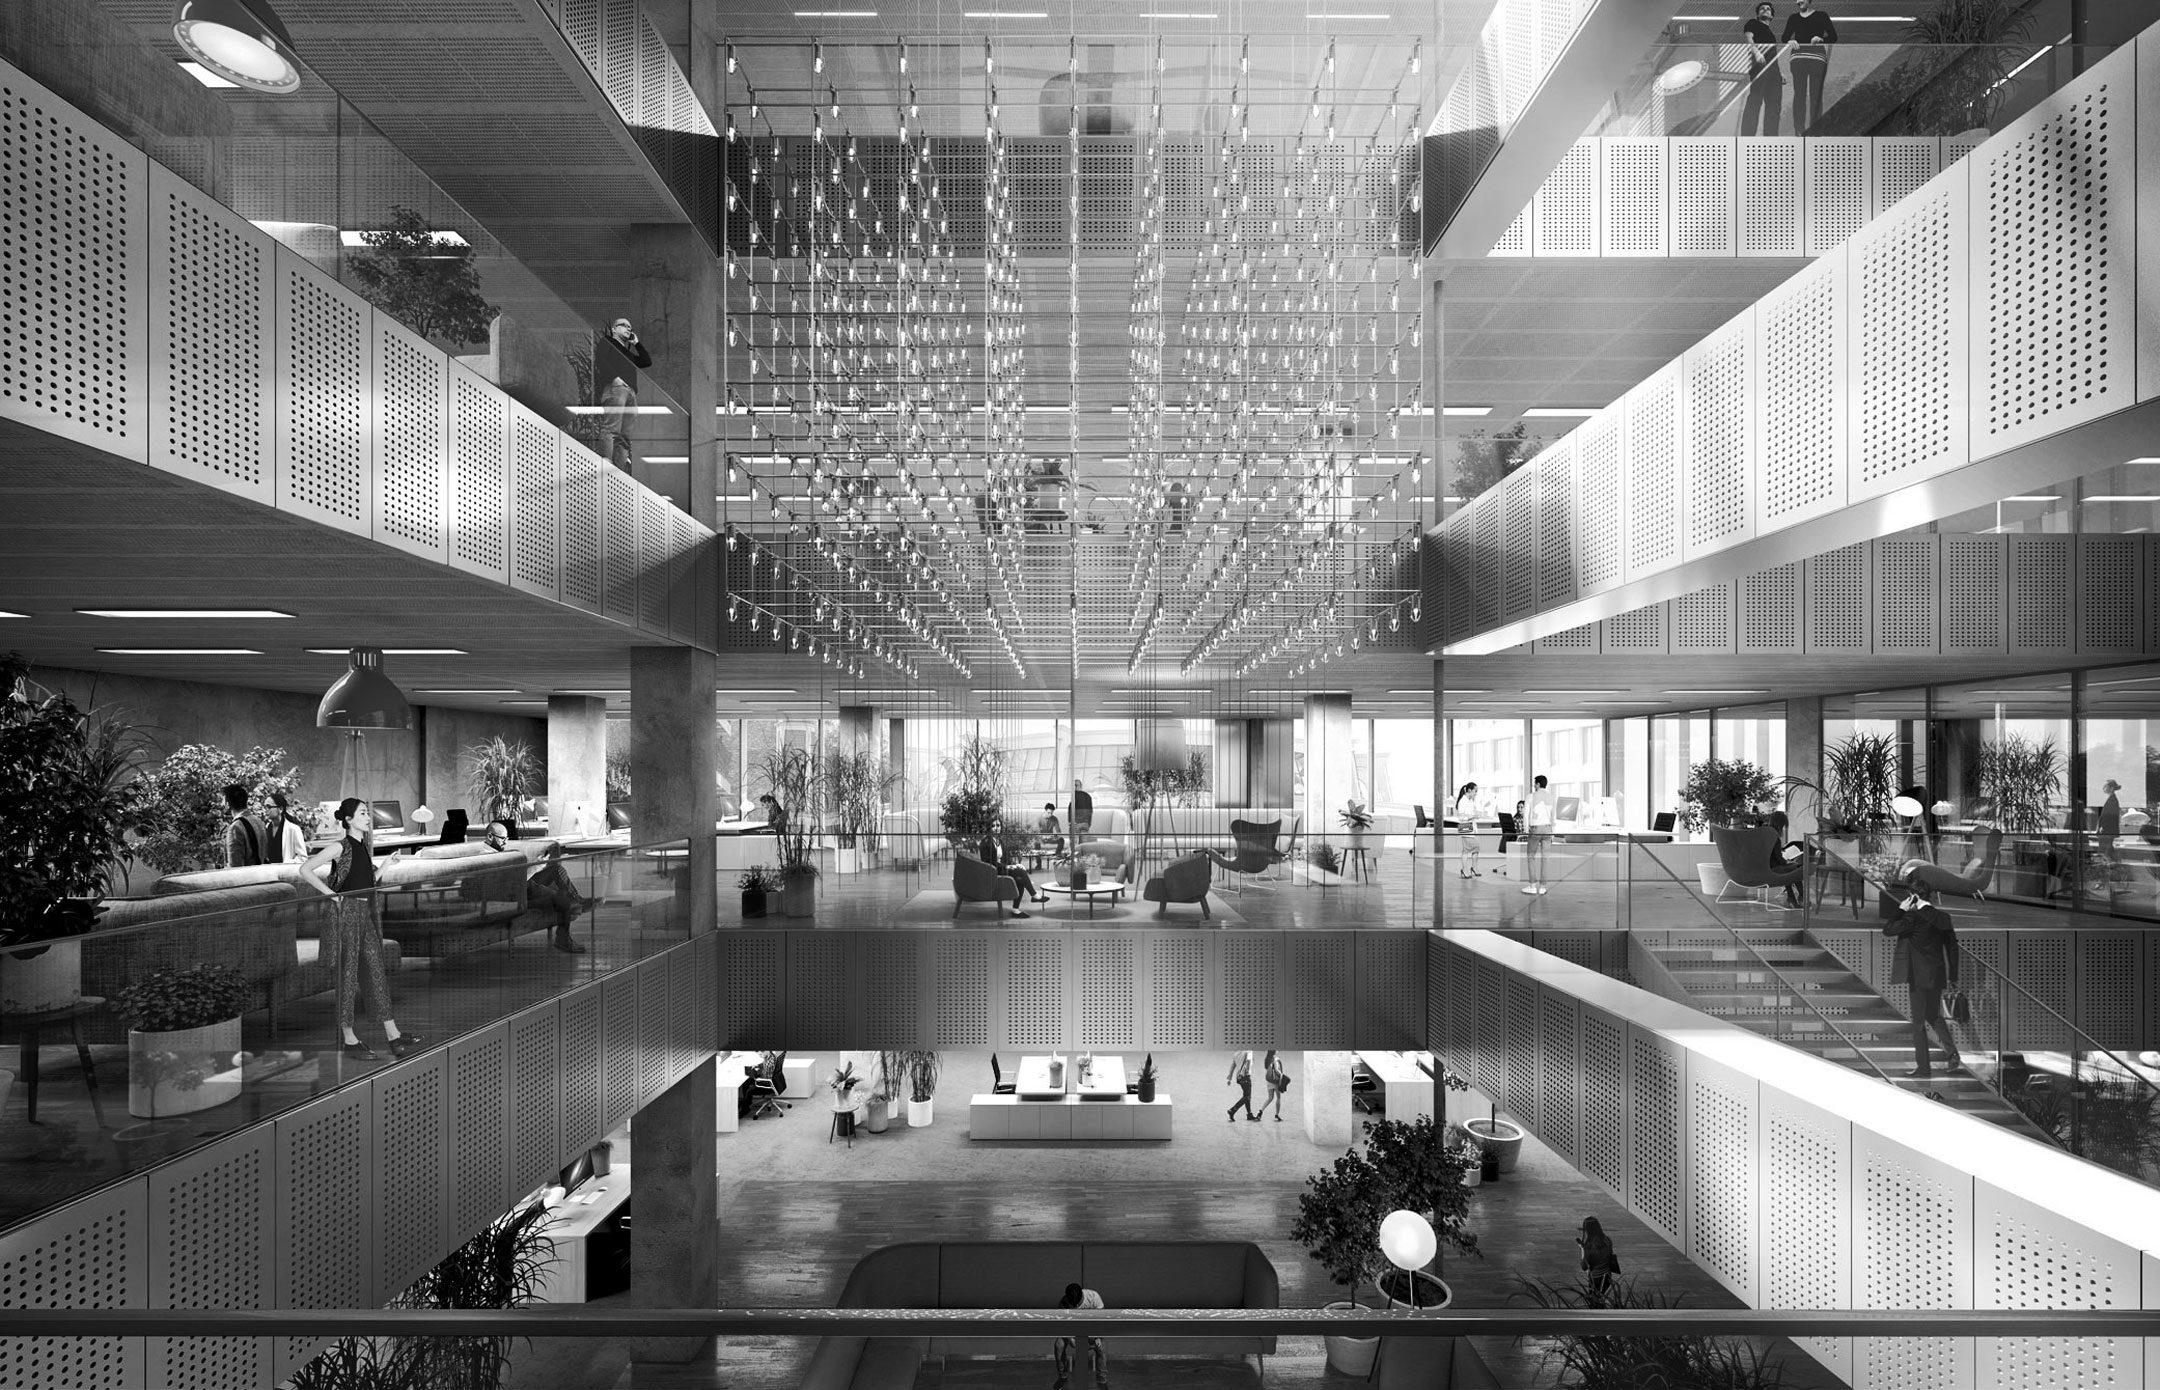 The Modernist - Architecture